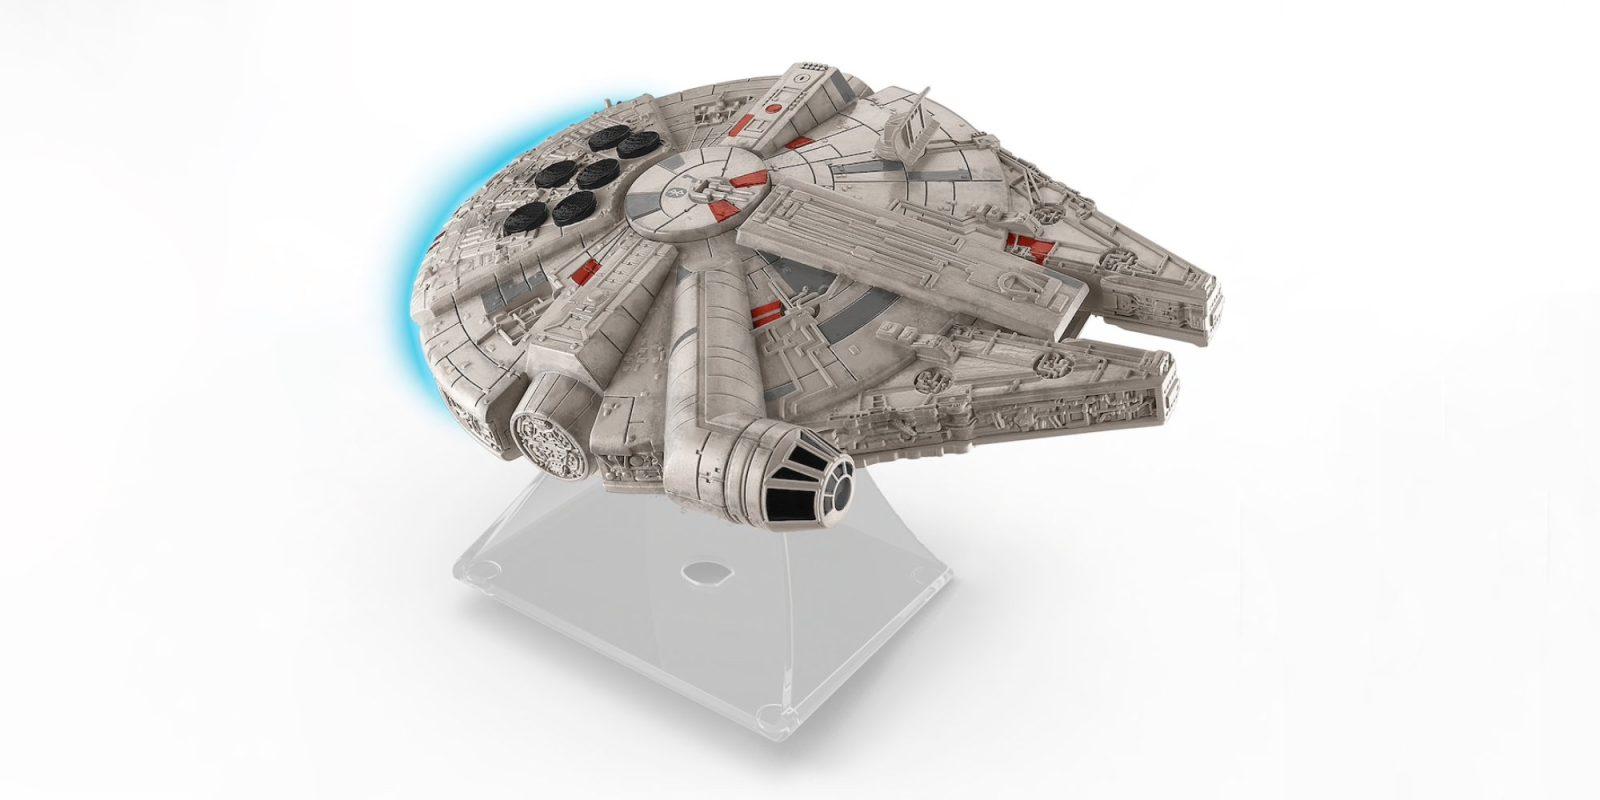 iHome's Millennium Falcon Bluetooth Speaker is made w/ Star Wars fans in mind: $23 (Reg. $40+)